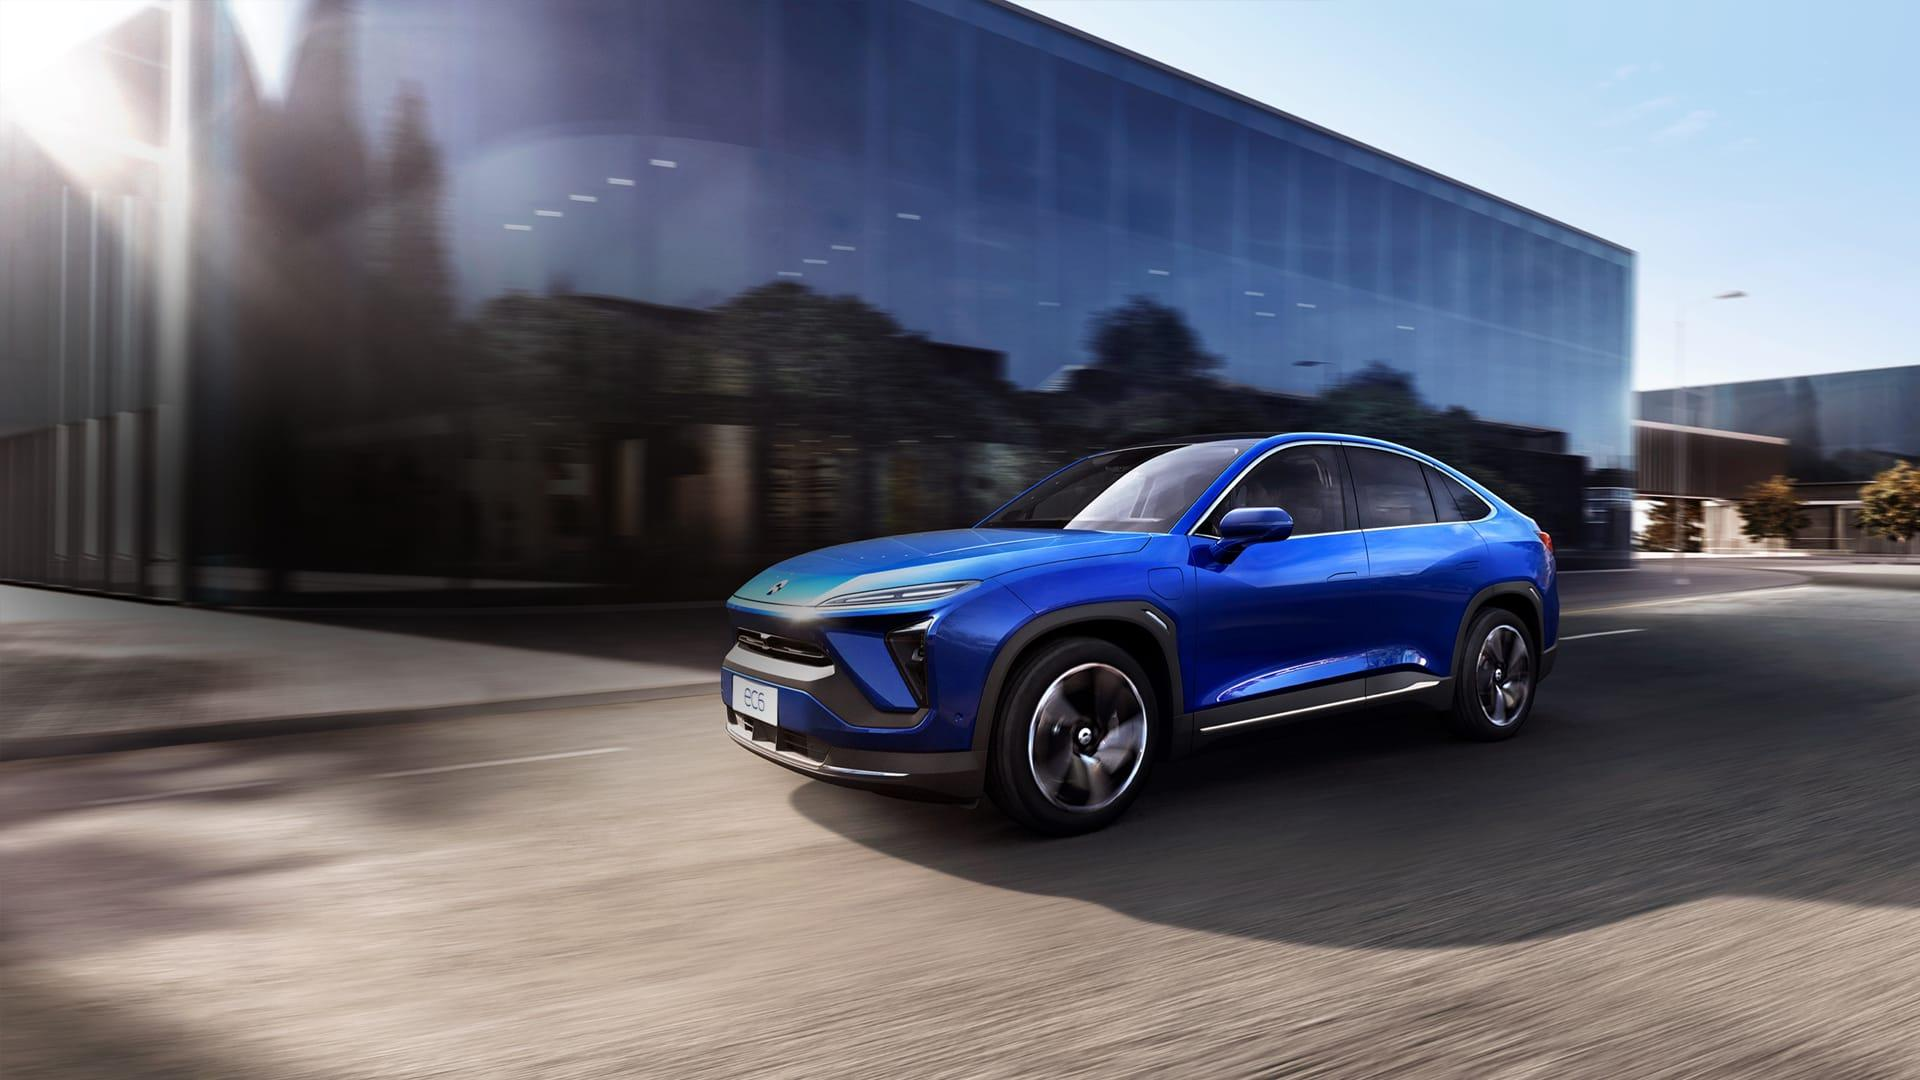 Nio busca vender sus autos eléctricos en Europa a partir de 2021